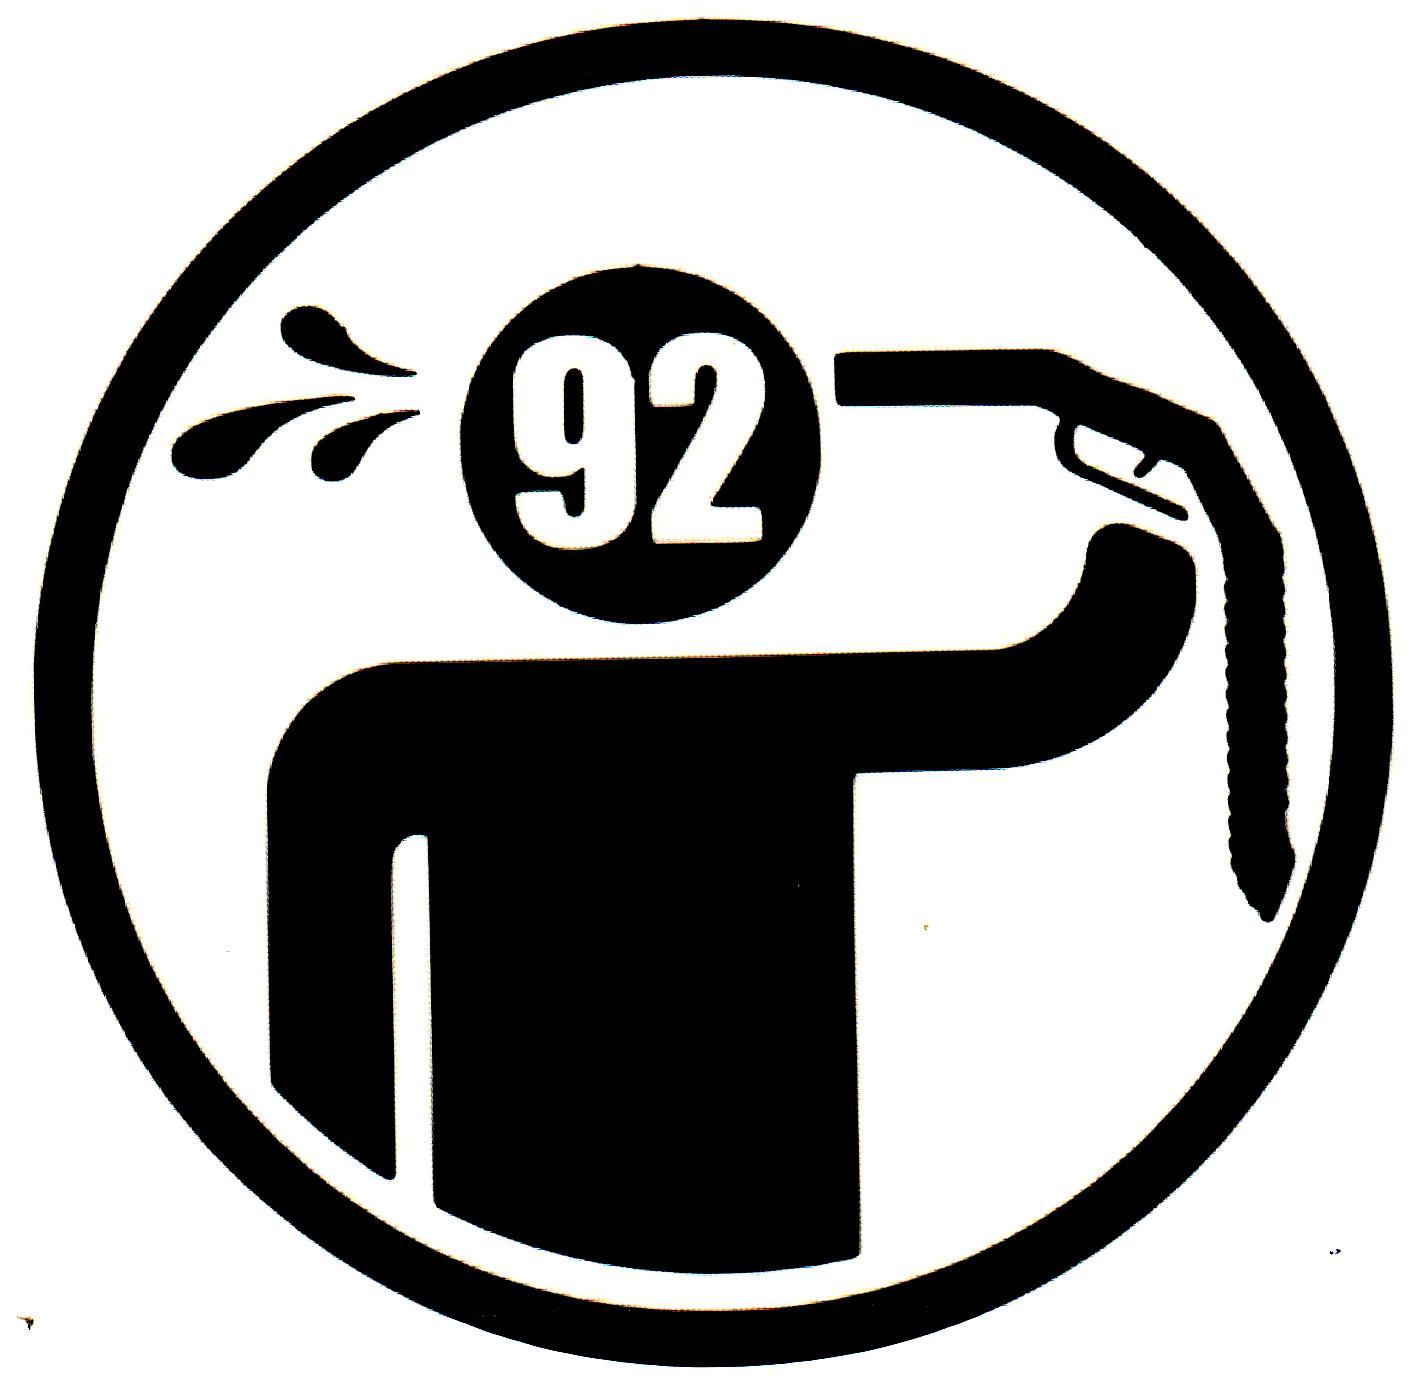 Наклейка автомобильная Mashinokom Цена АИ-92, VRC 015-10, 11,5*11,5 см наклейка автомобильная mashinokom внимание дети vrc 431 03 винил 10х12 см